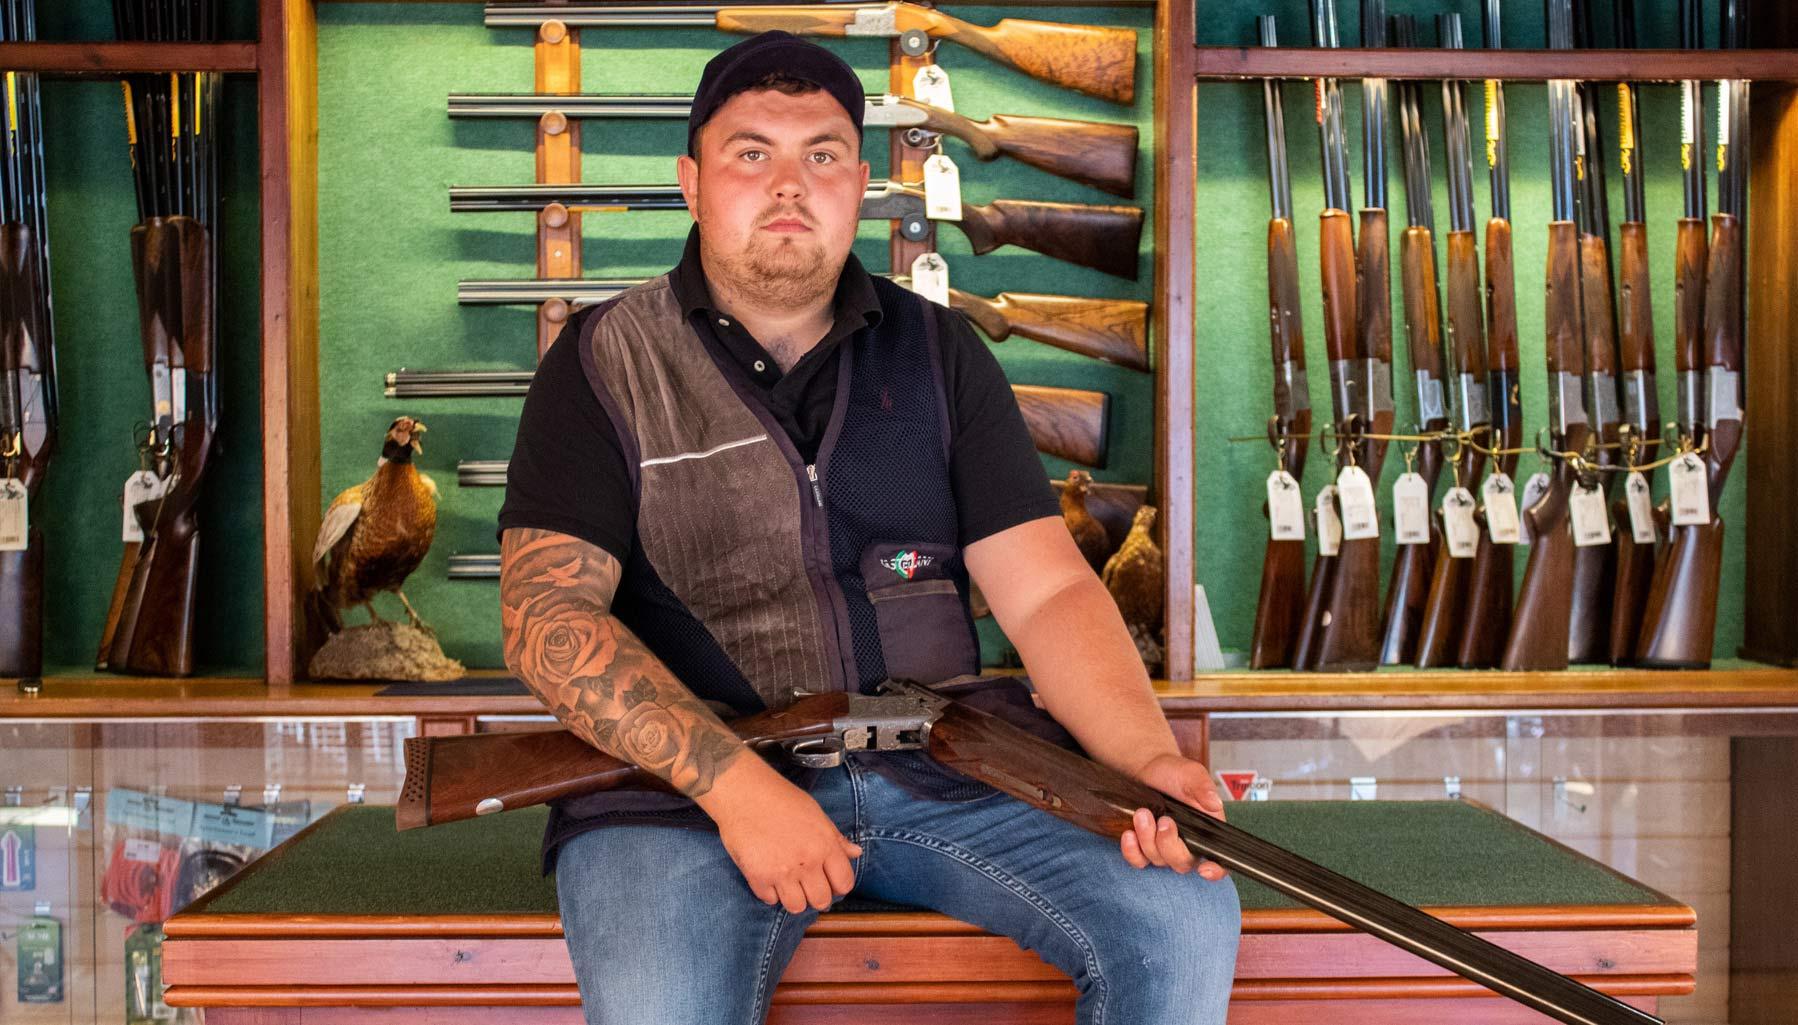 New & Used Shotguns, Rifles, Airguns & Hunting Accessories